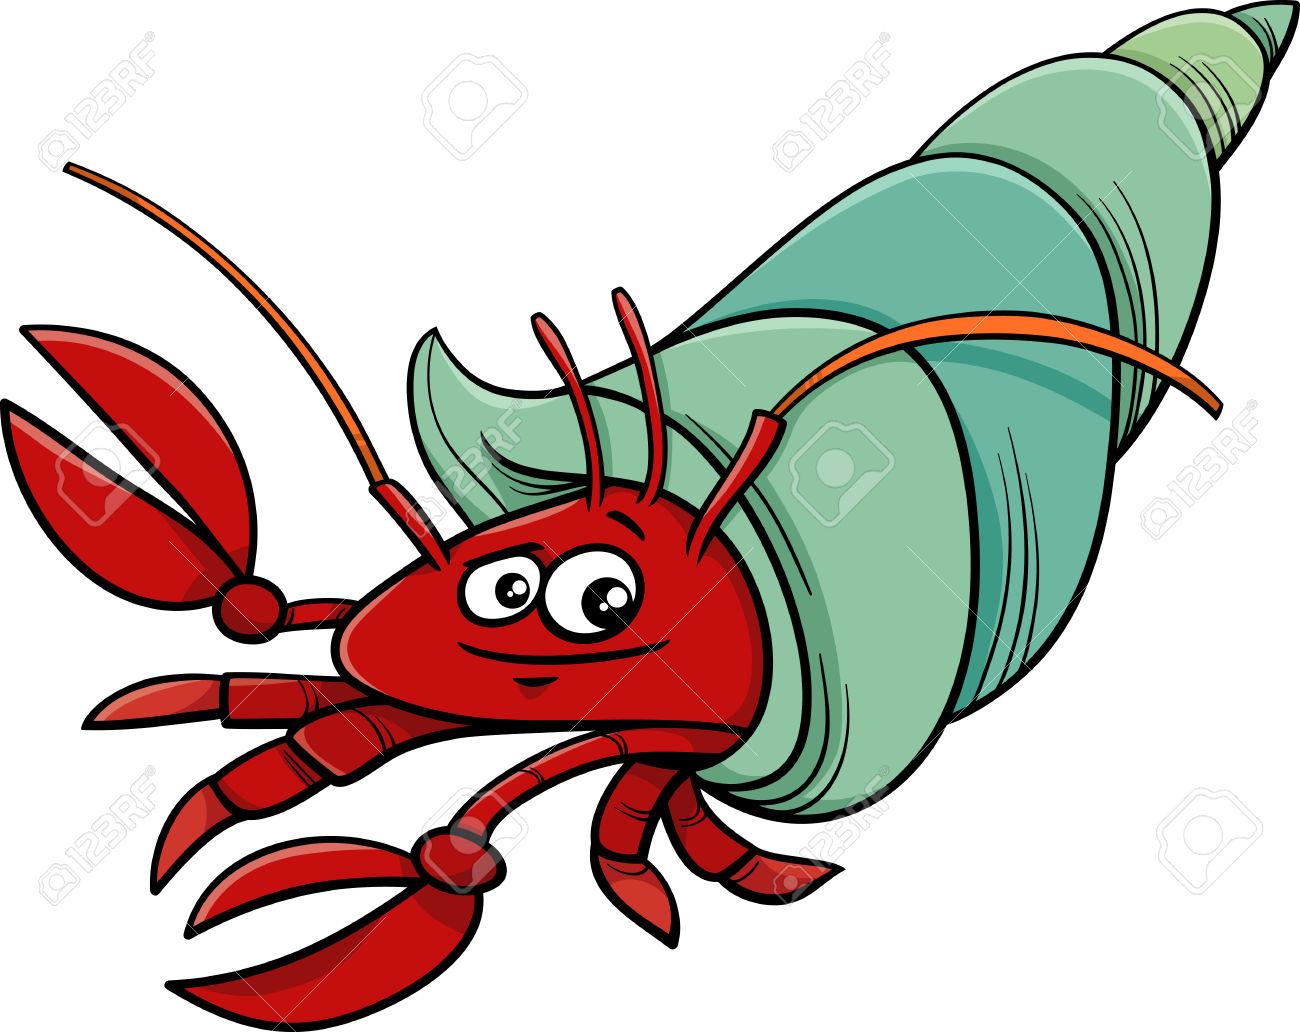 Hermit crab clip art.